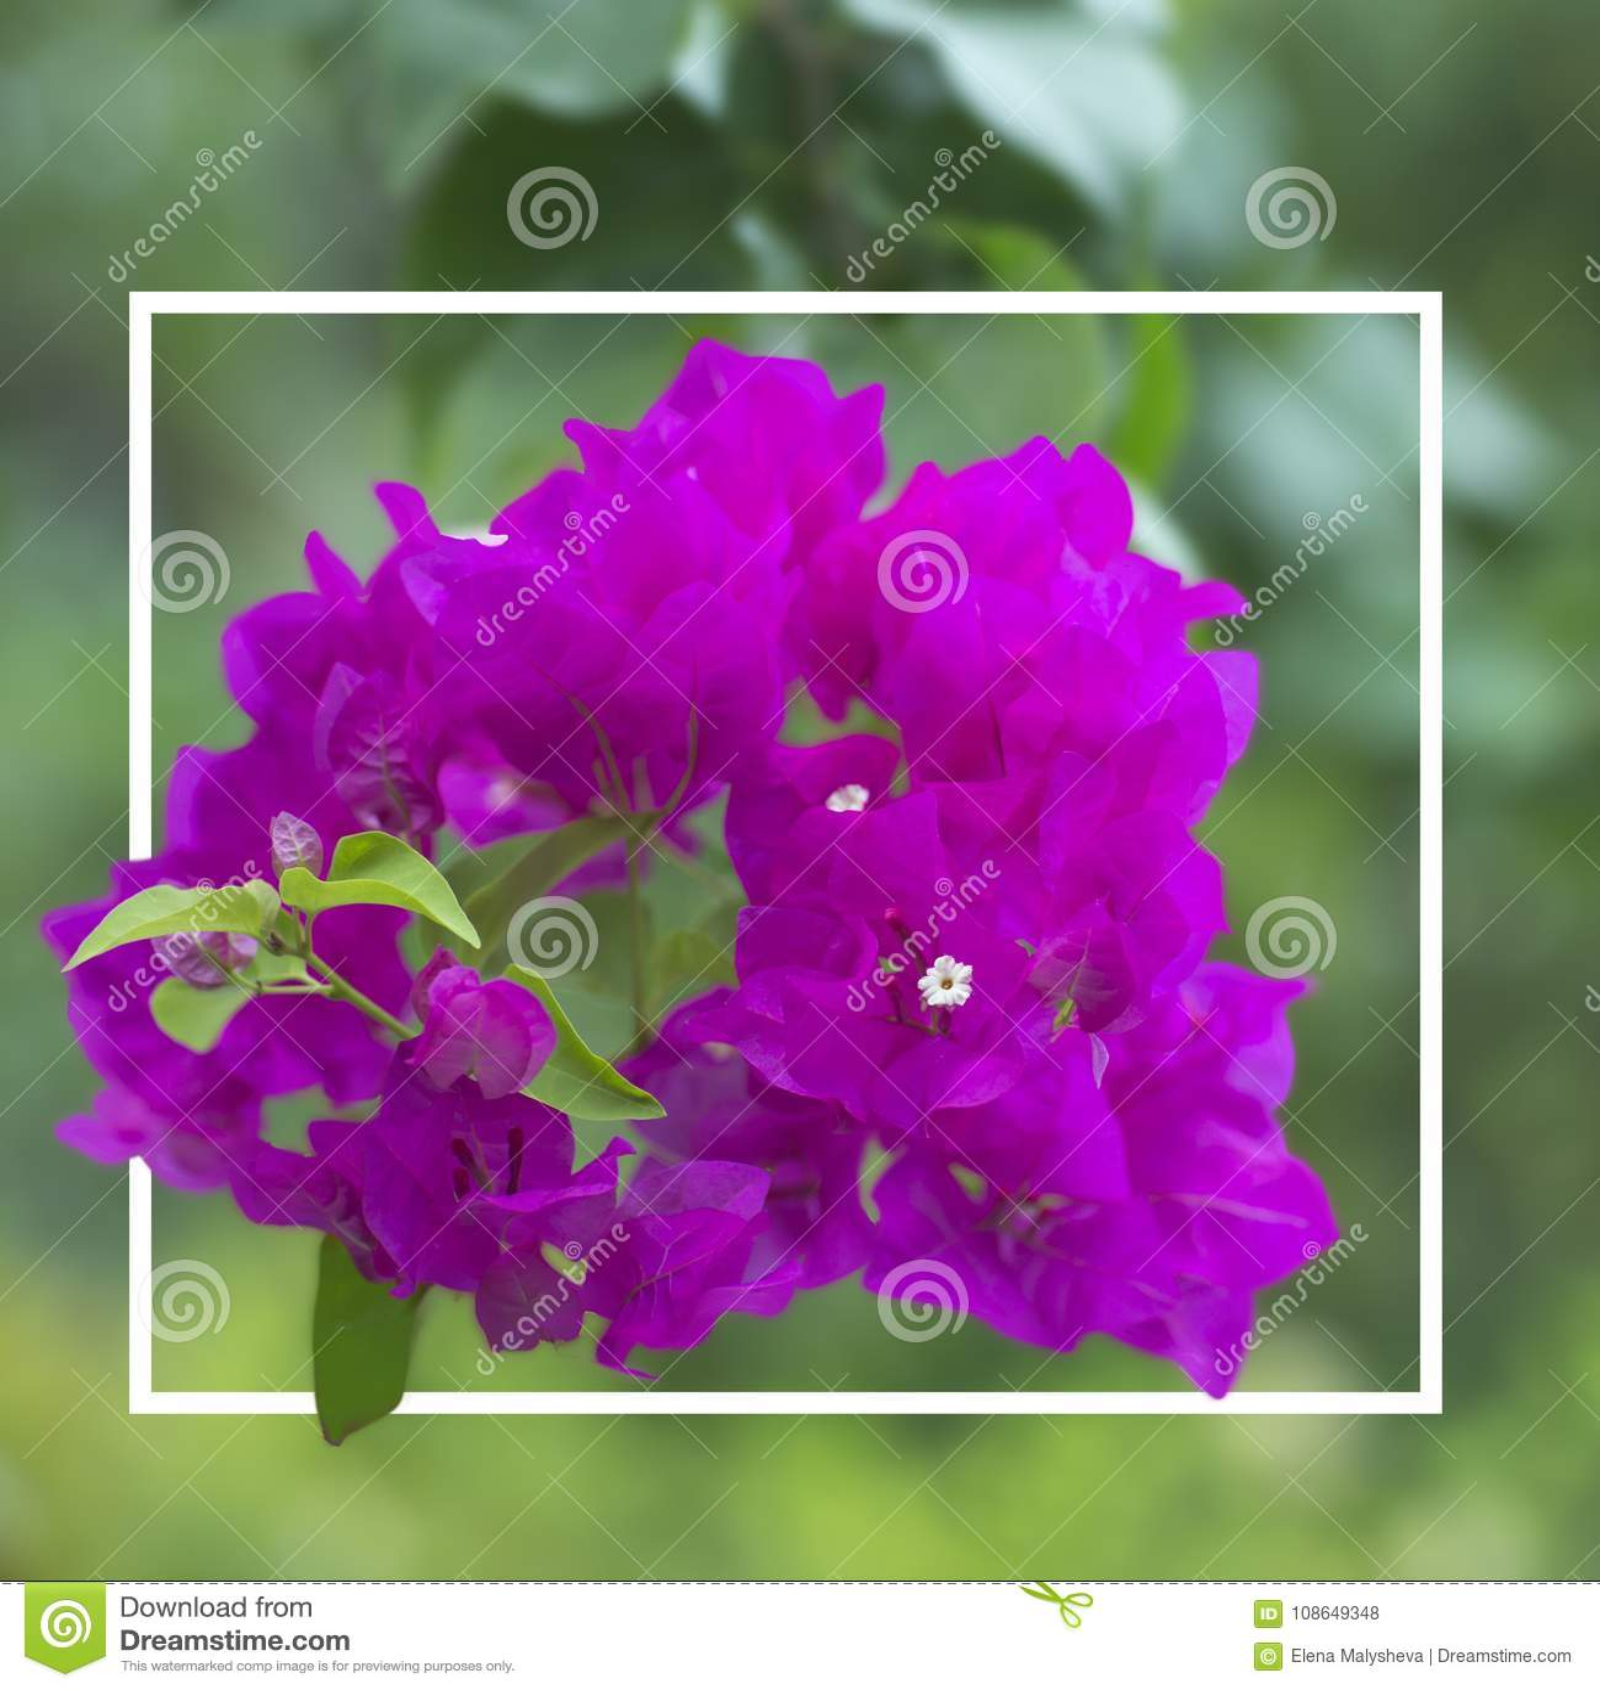 Flowering Bush Syarkimi Flowers Stock Photo Image Of Macro Branch